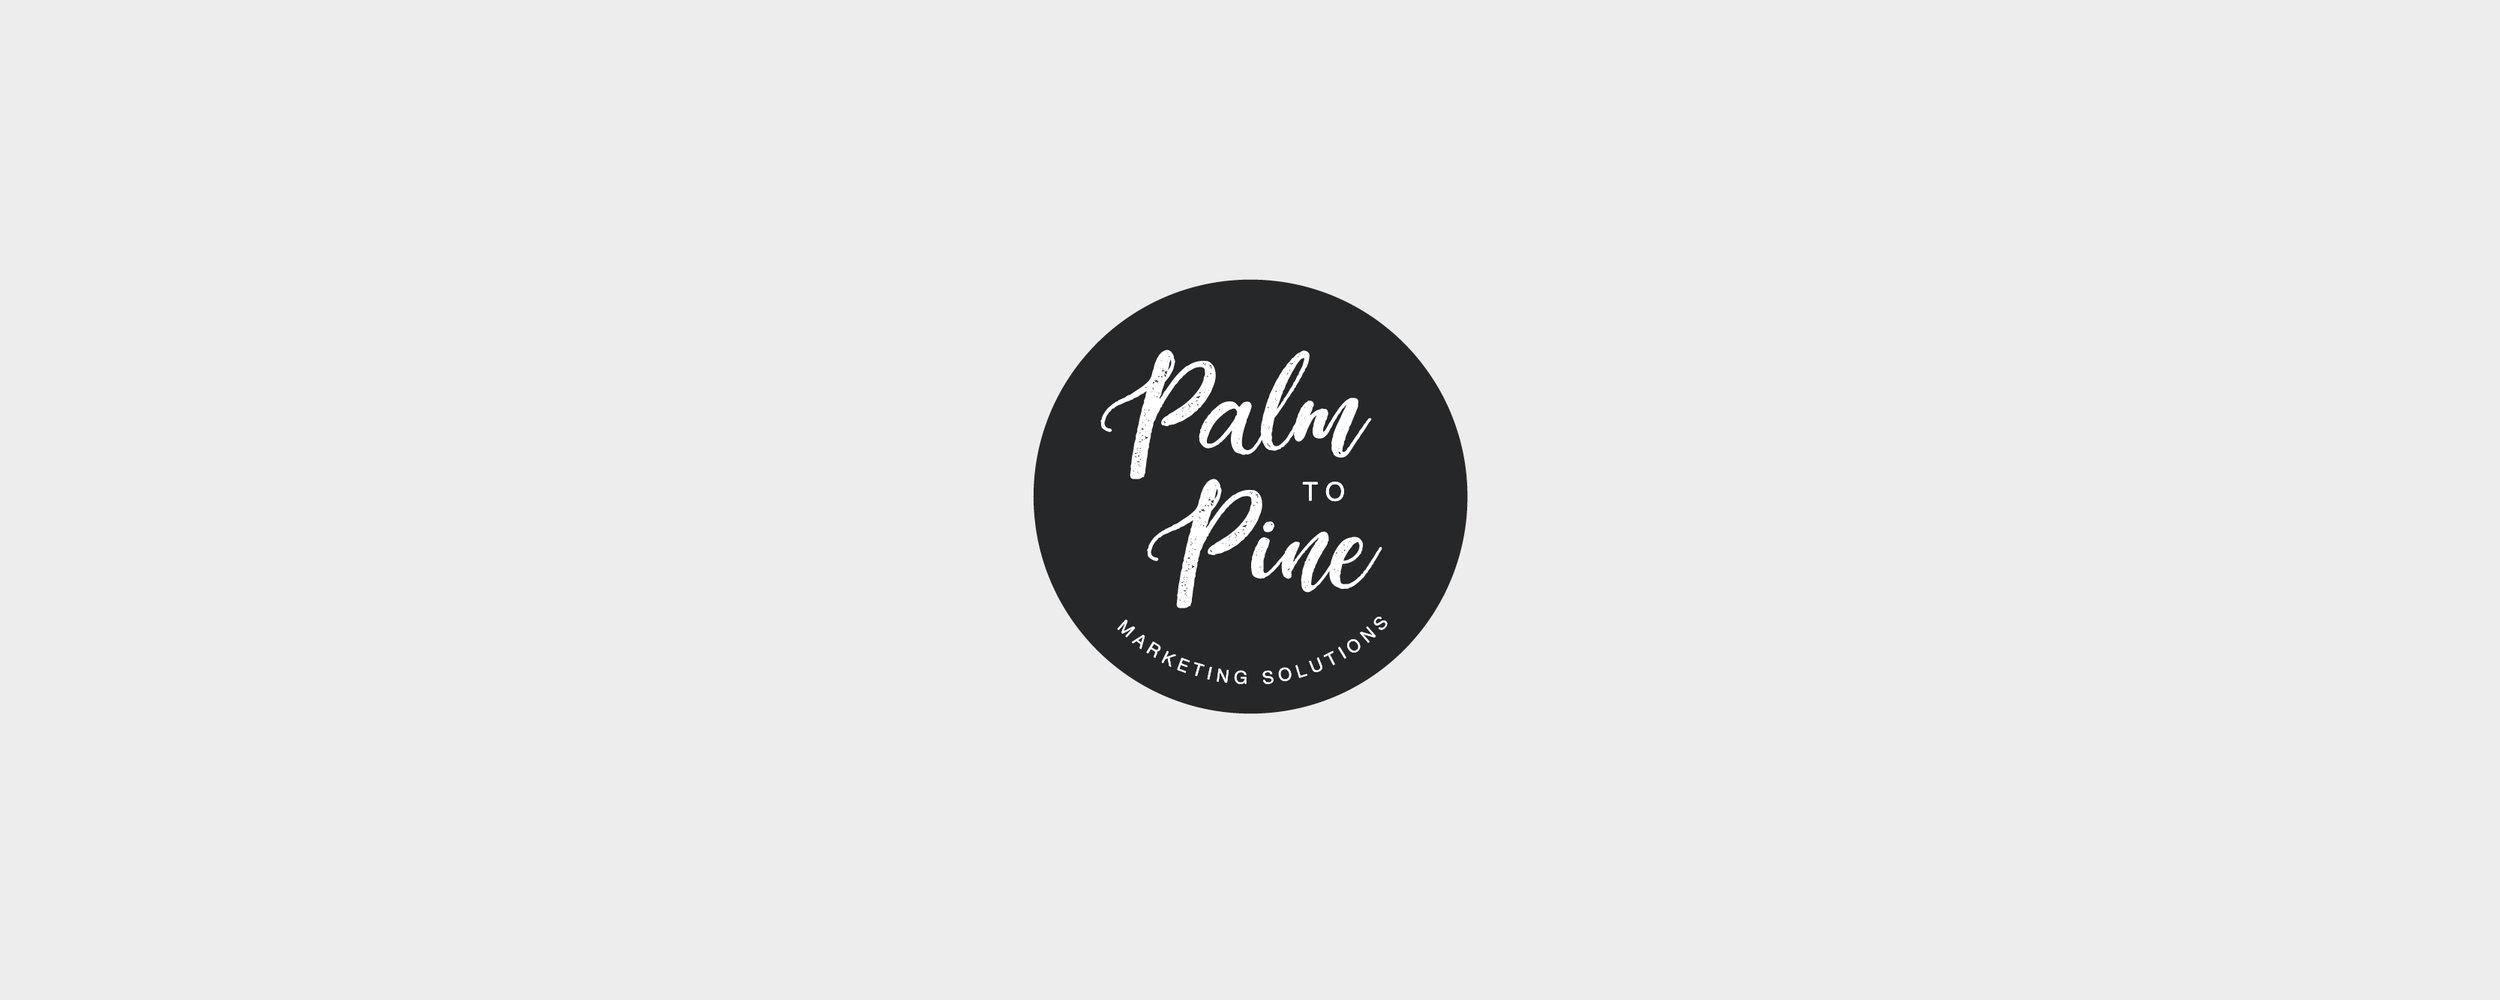 Palm to Pine_01.jpg